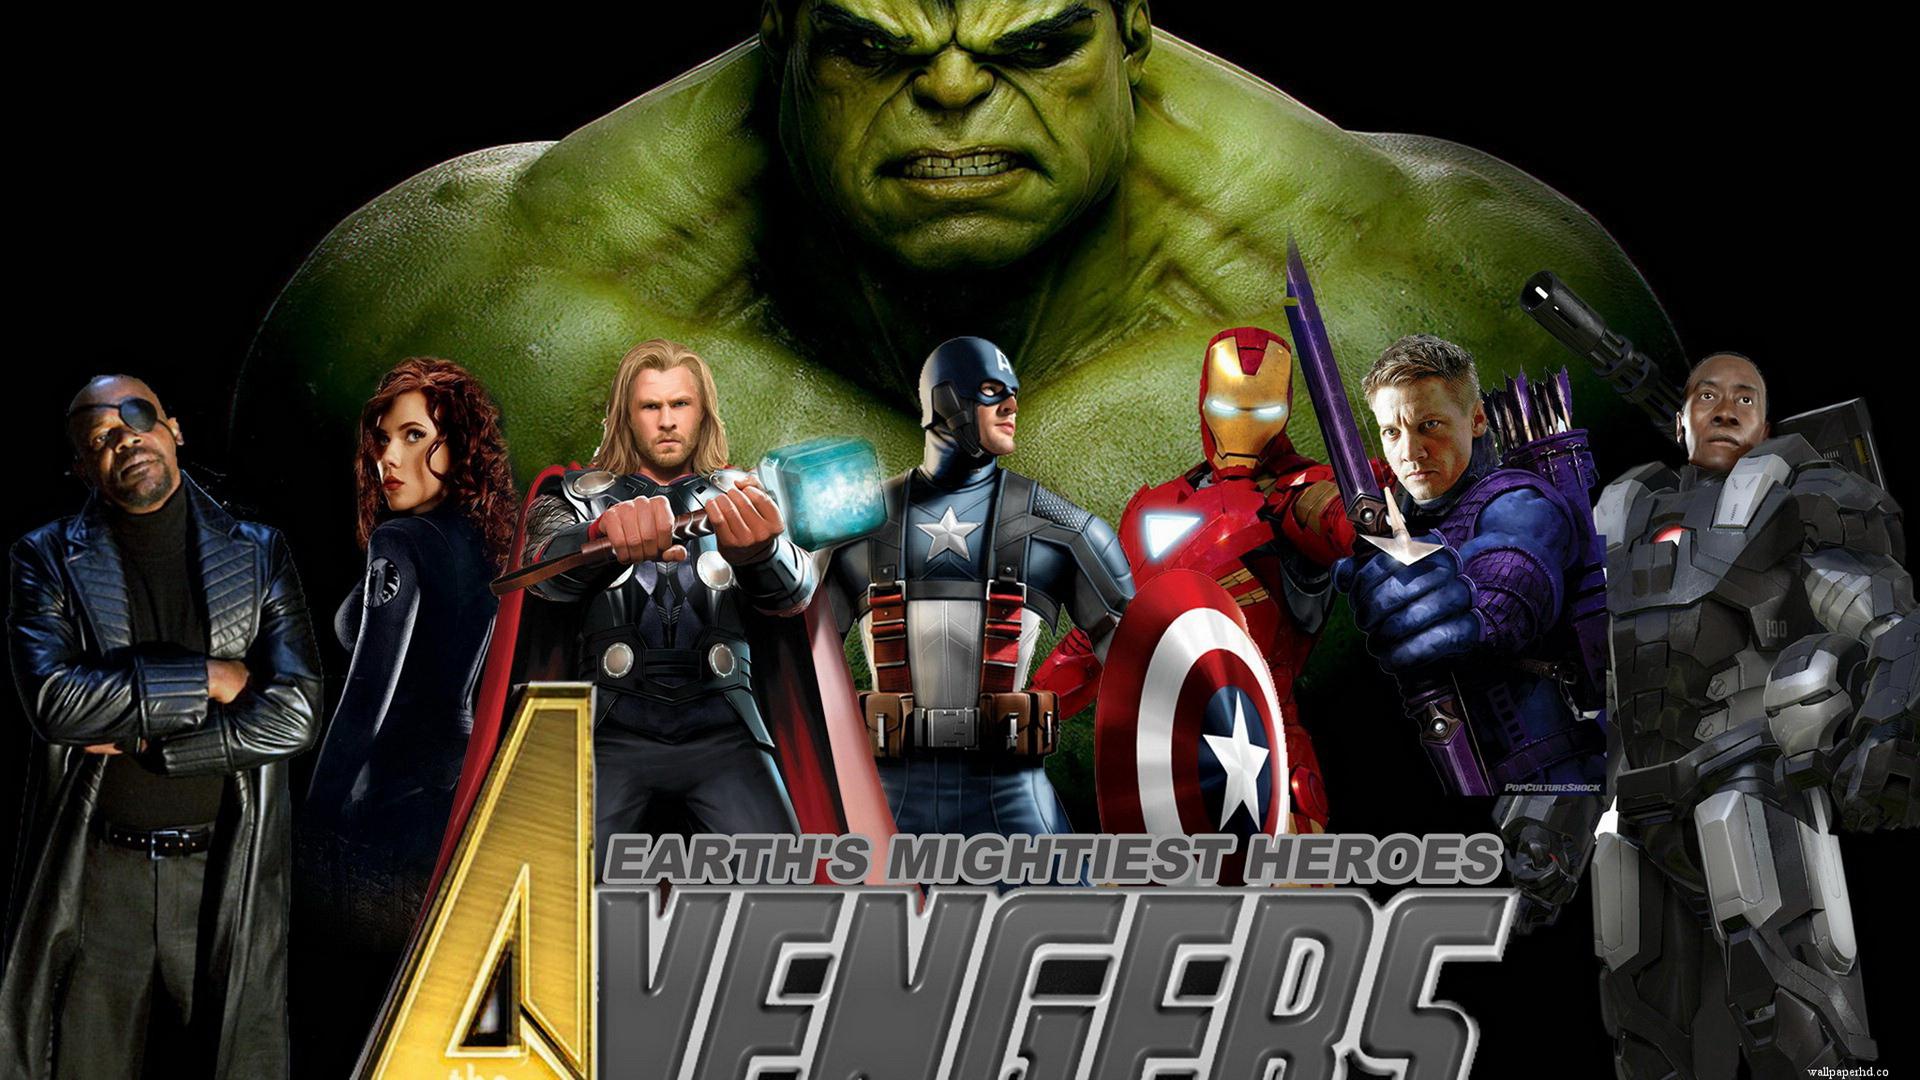 Avengers hd wallpapers 1080p wallpapersafari - Avengers hd wallpapers free download ...